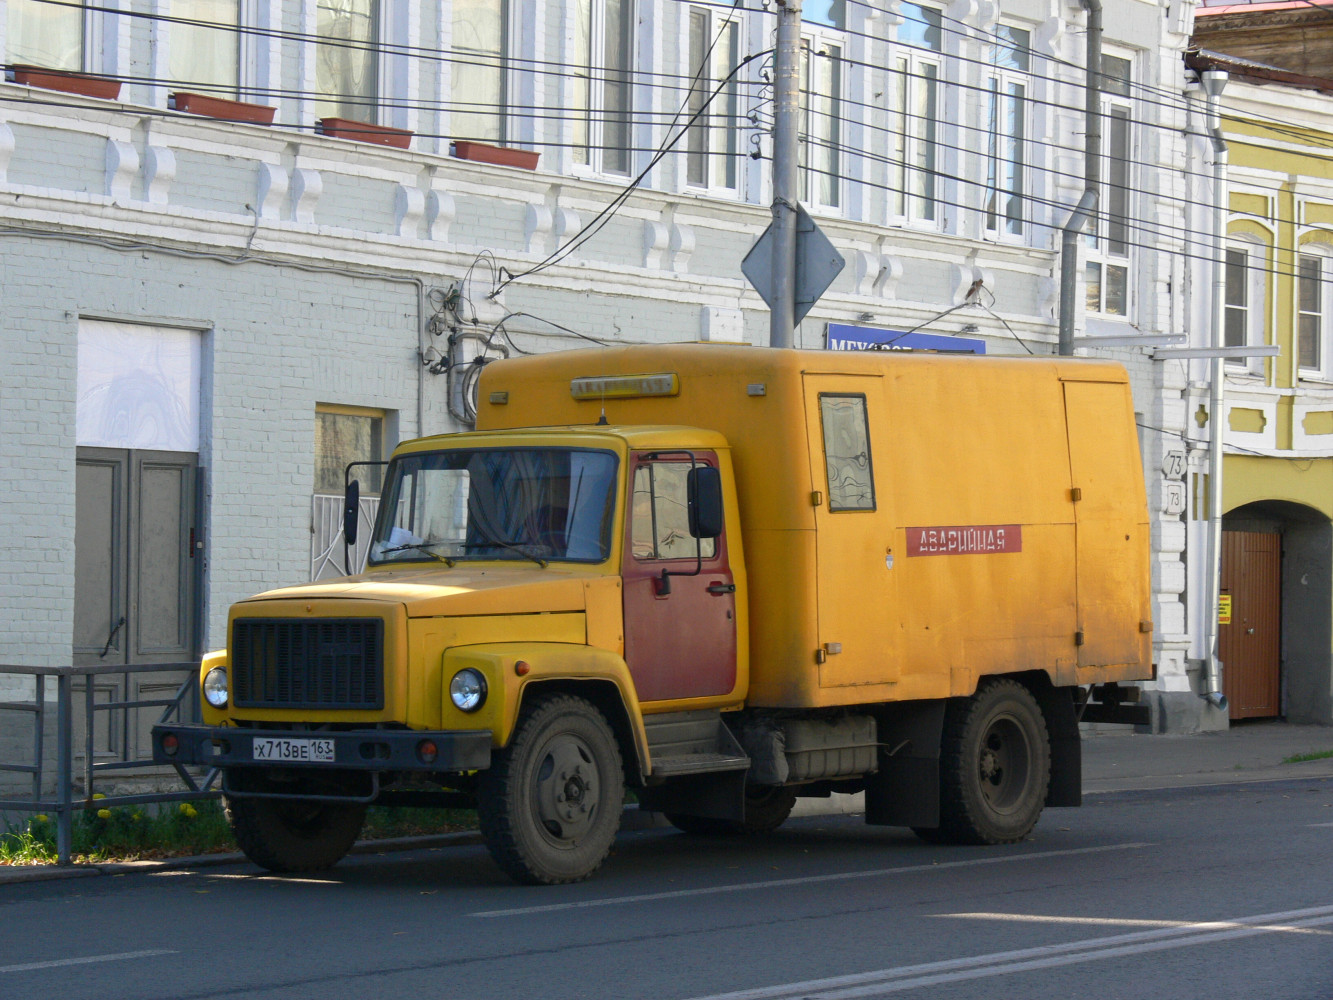 Мастерская на шасси ГАЗ-3307 #х 713 ве 163. г. Самара, ул. Льва Толстого